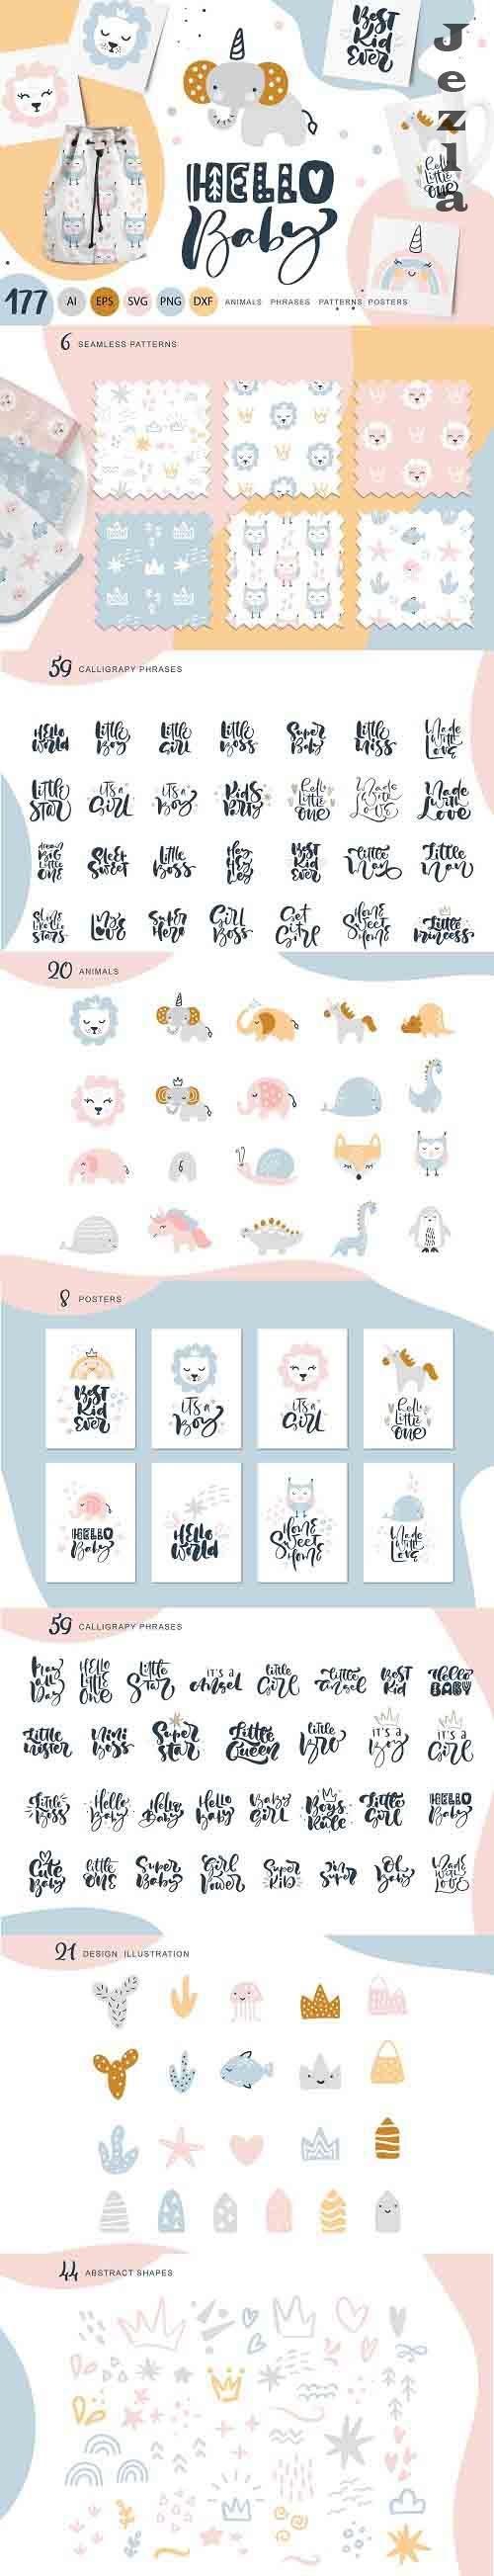 Hello Baby animals & calligraphy - 6204021